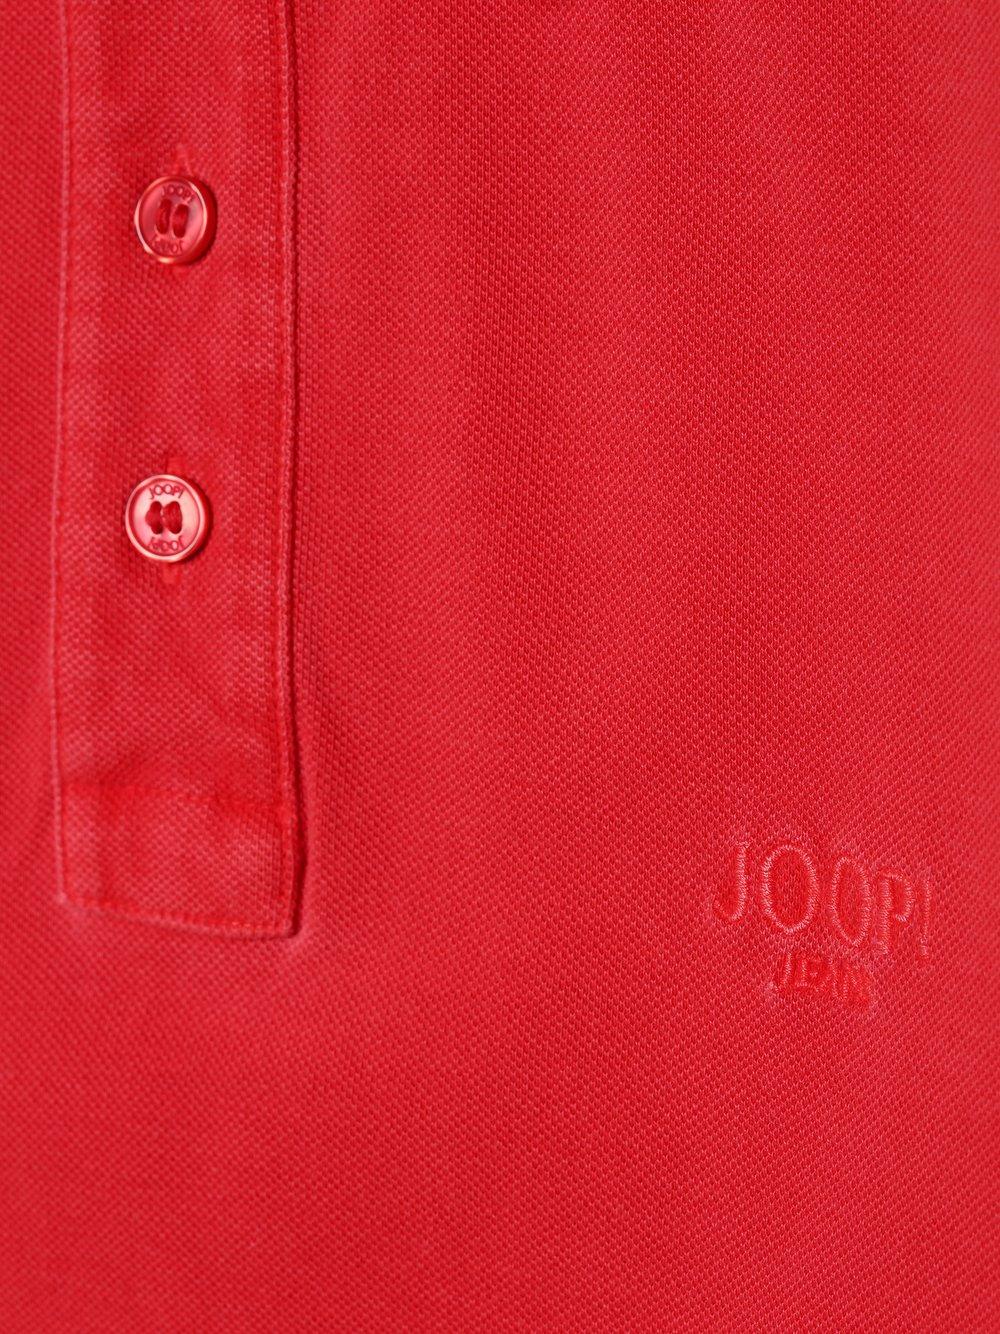 finest selection 092ac 82b77 Herren Poloshirt - Ambrosio